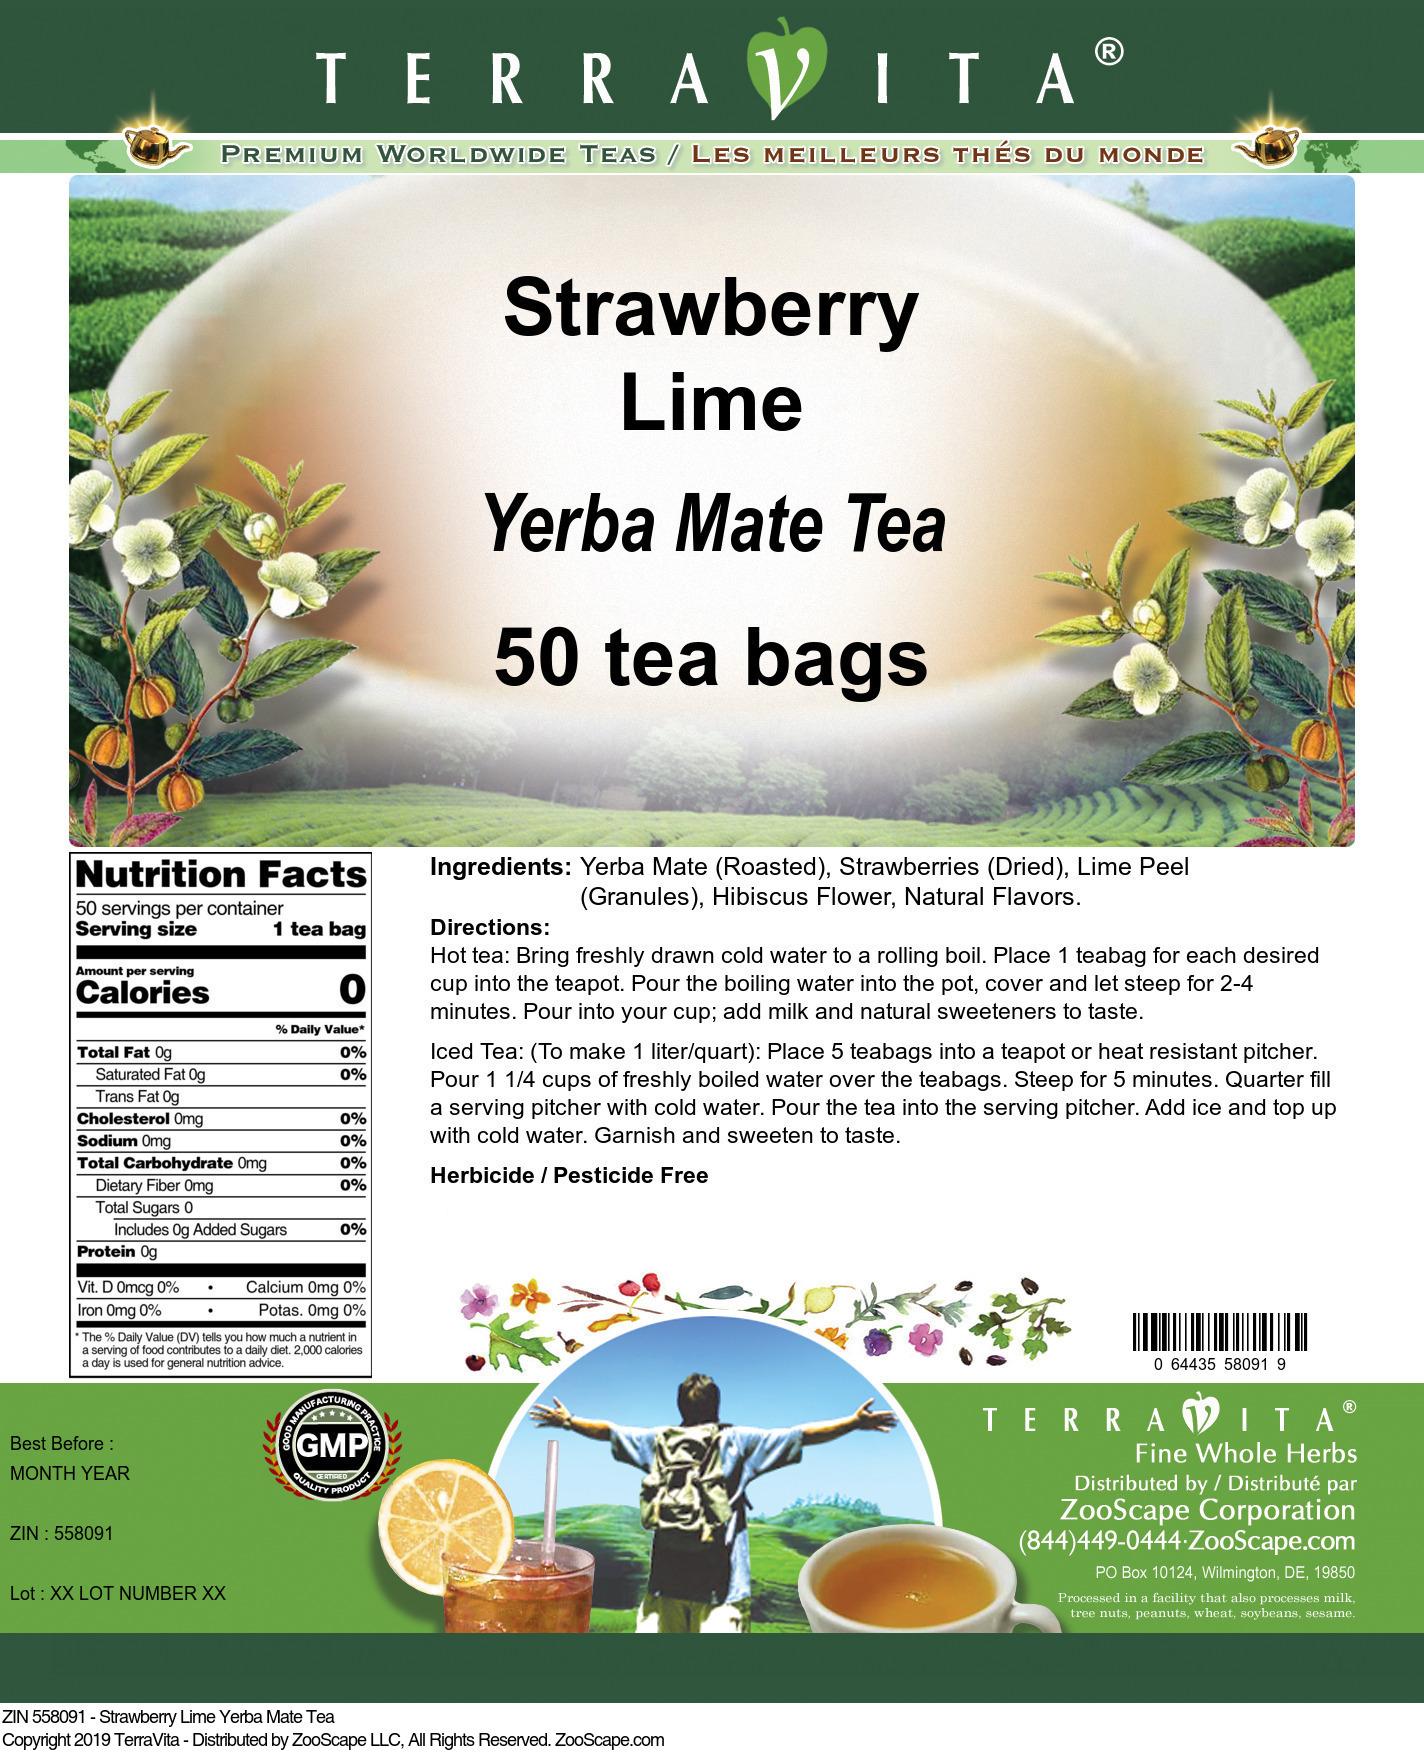 Strawberry Lime Yerba Mate